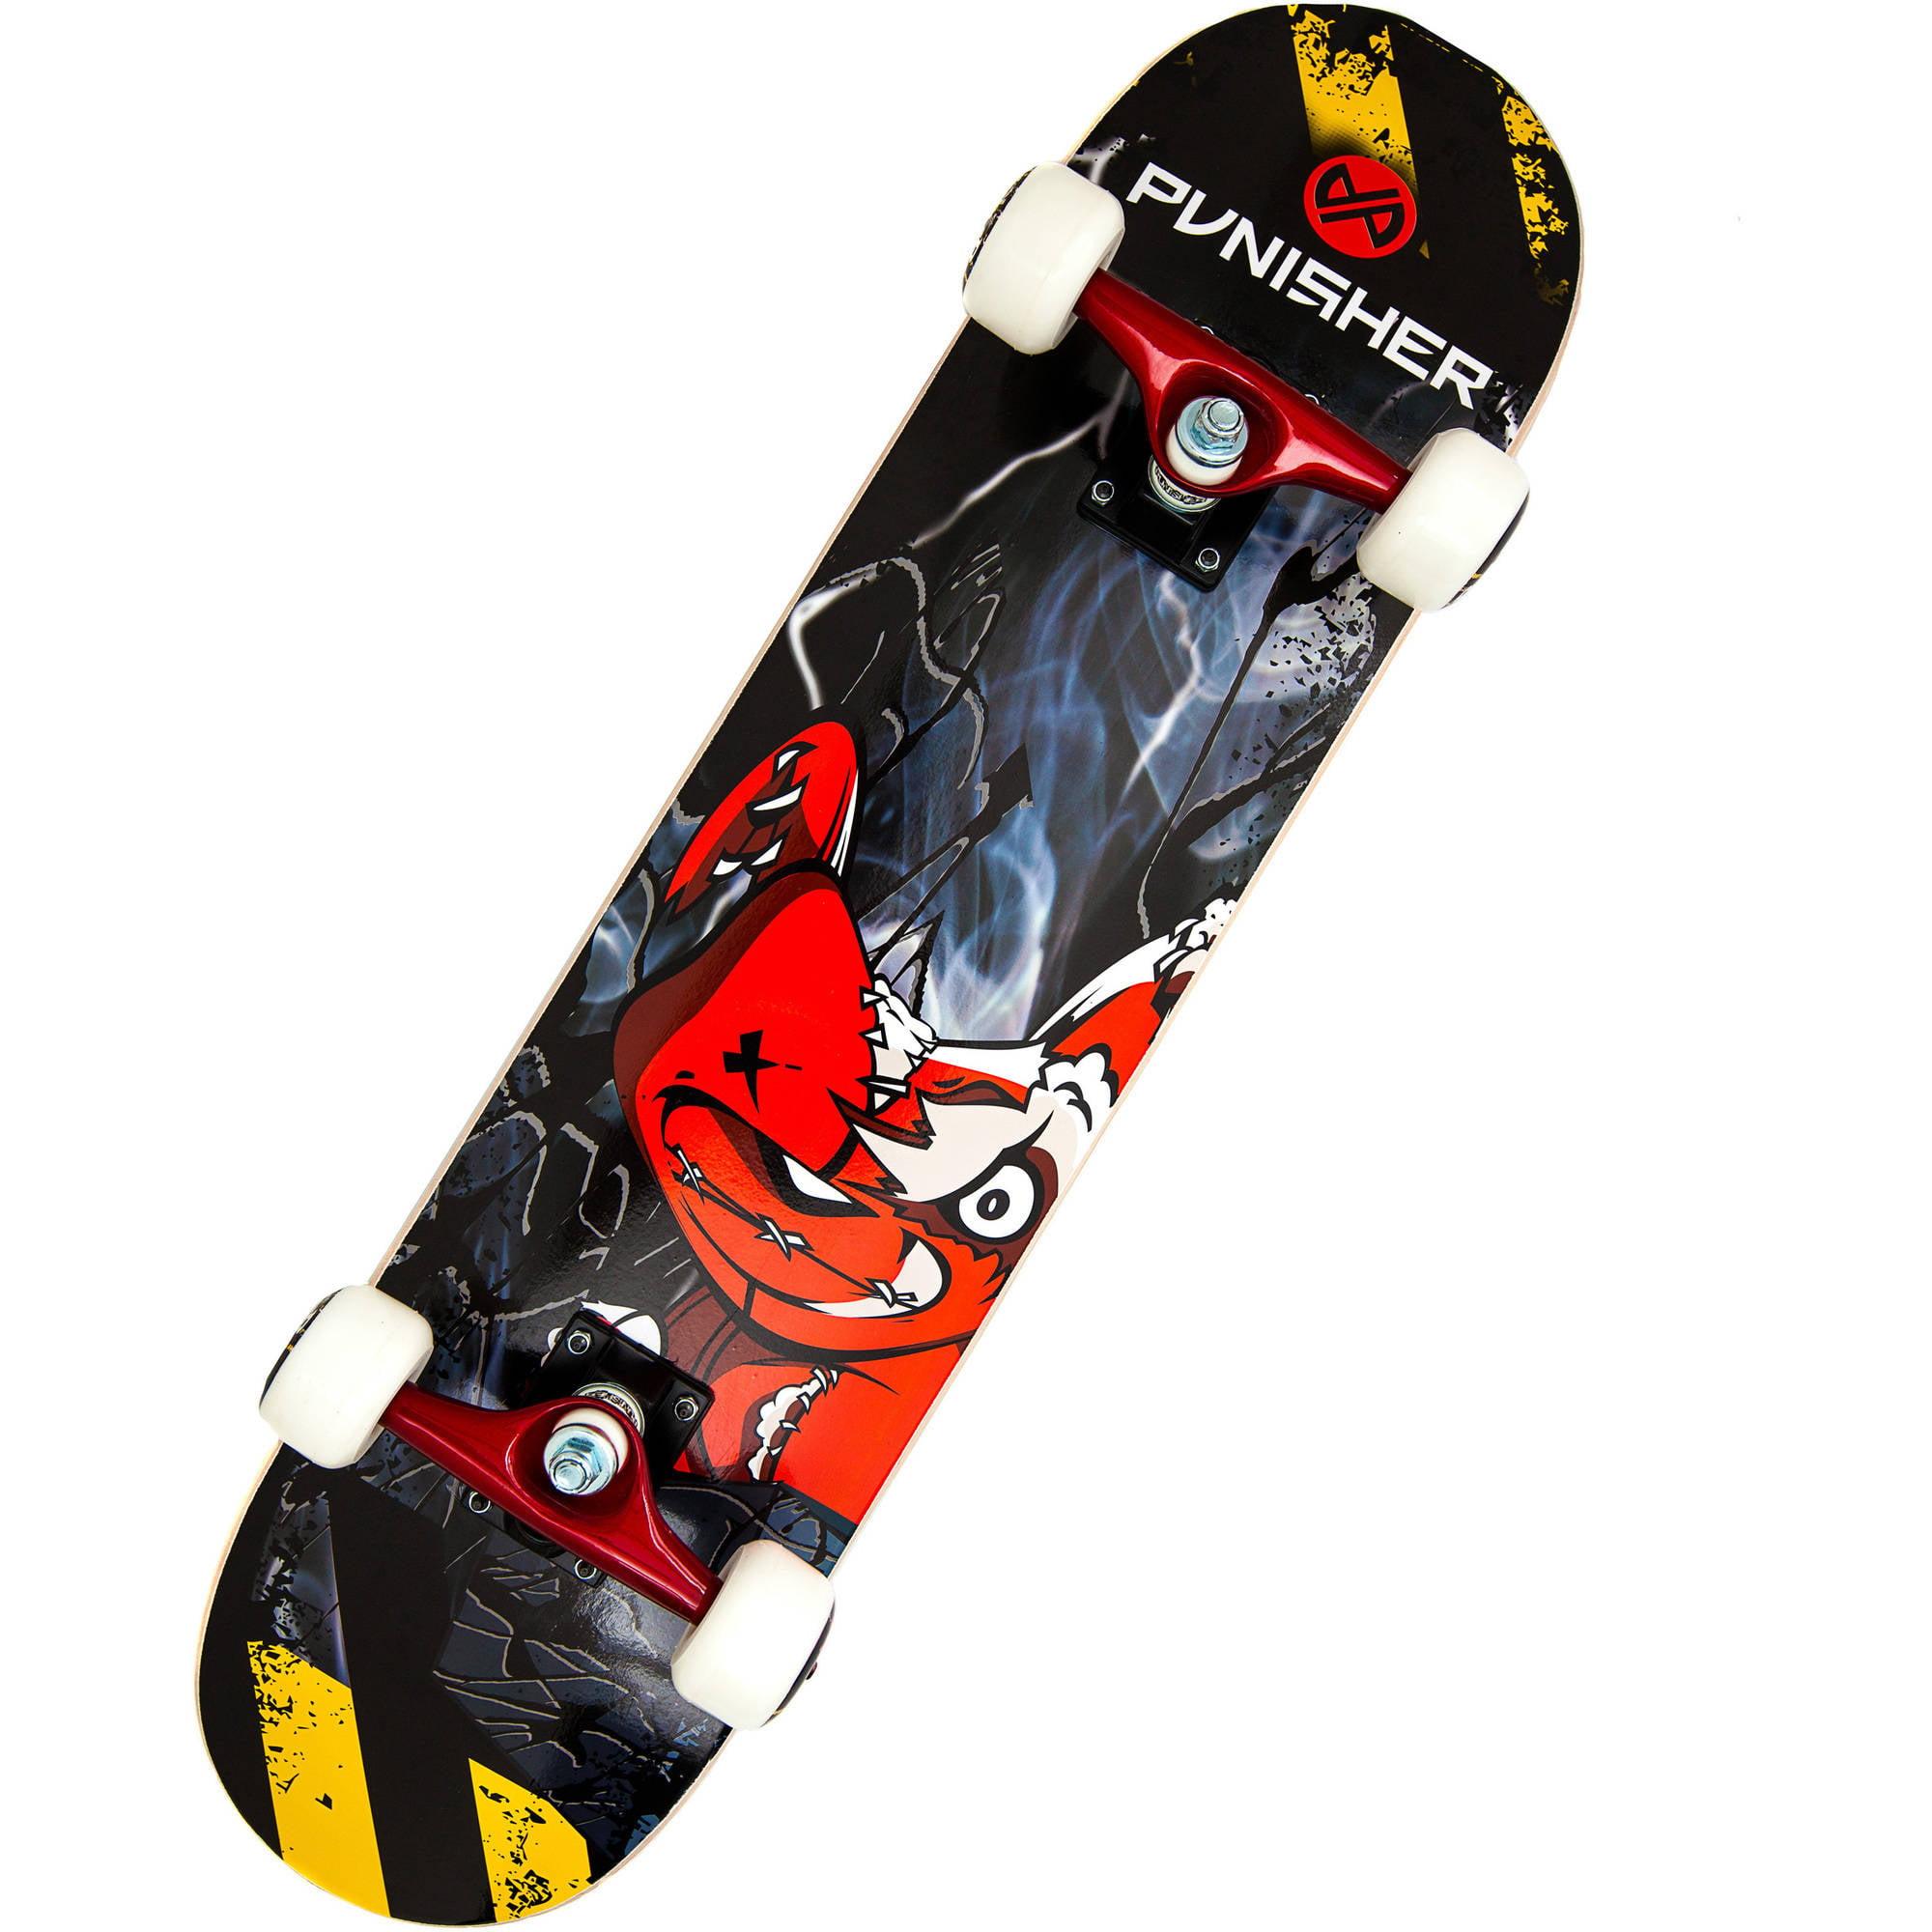 "Punisher Skateboards Teddy 31.5"" ABEC-7 Complete Skateboard by Generic"